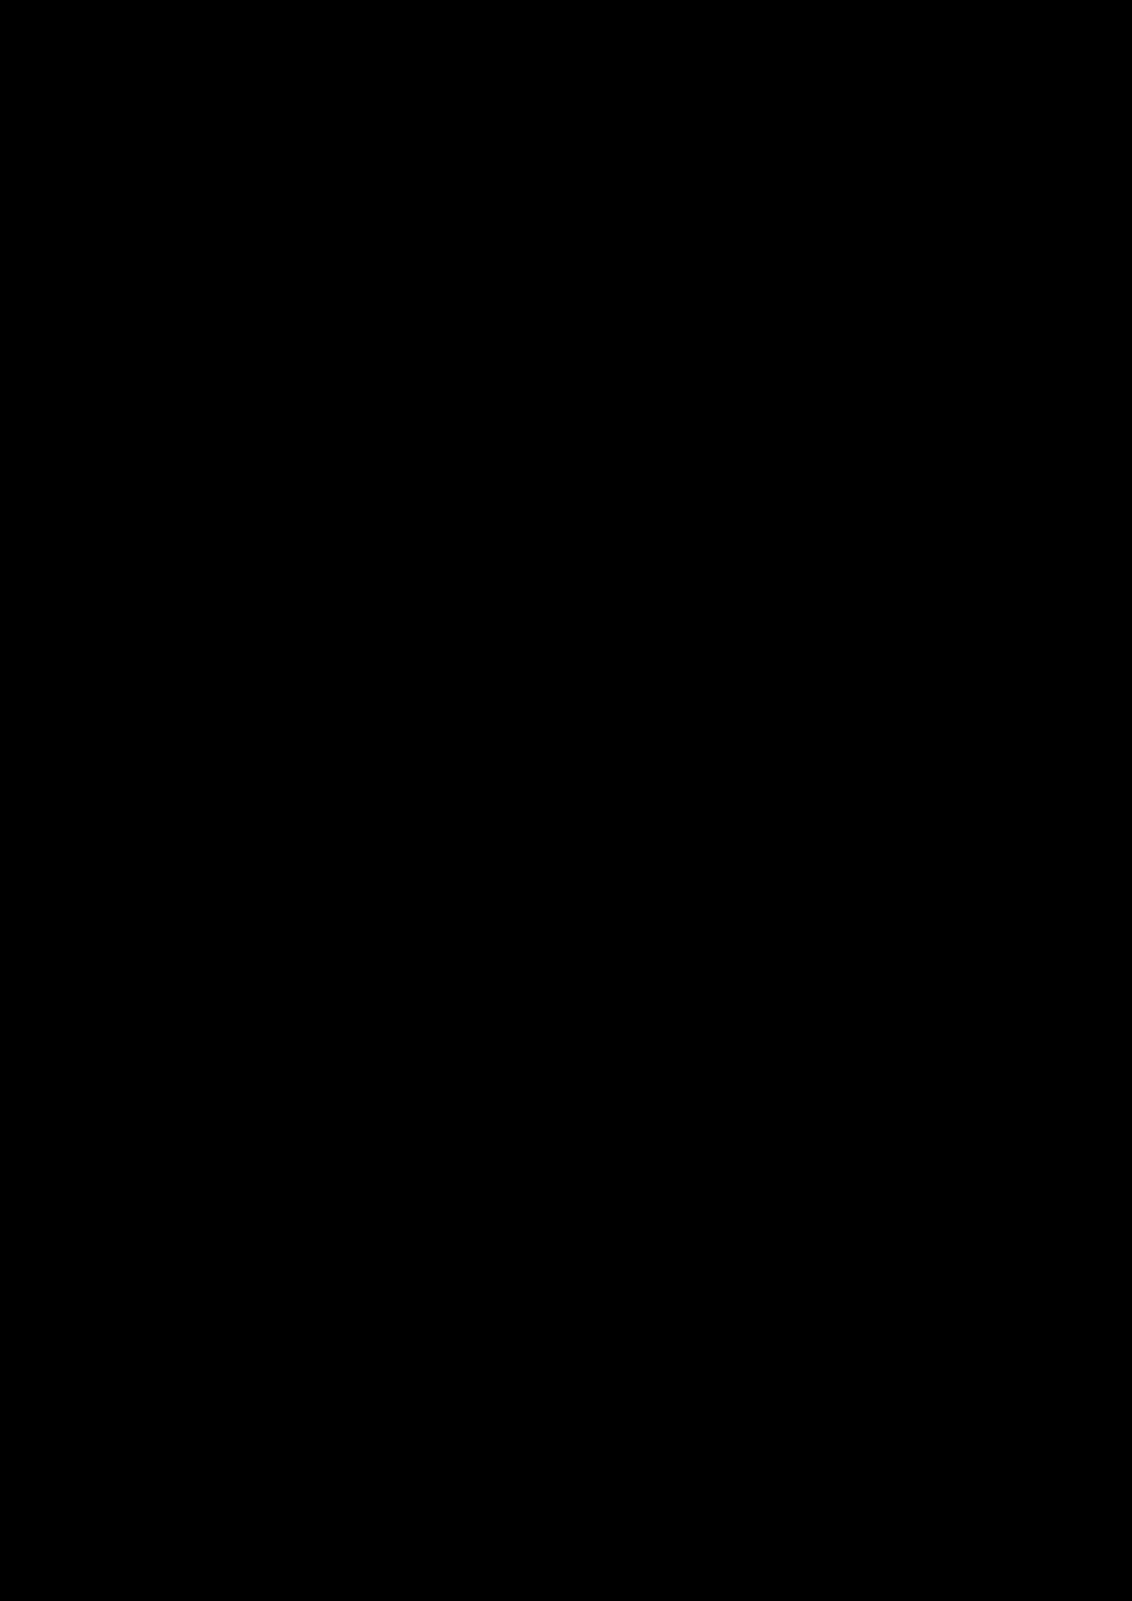 Belyiy sokol slide, Image 135